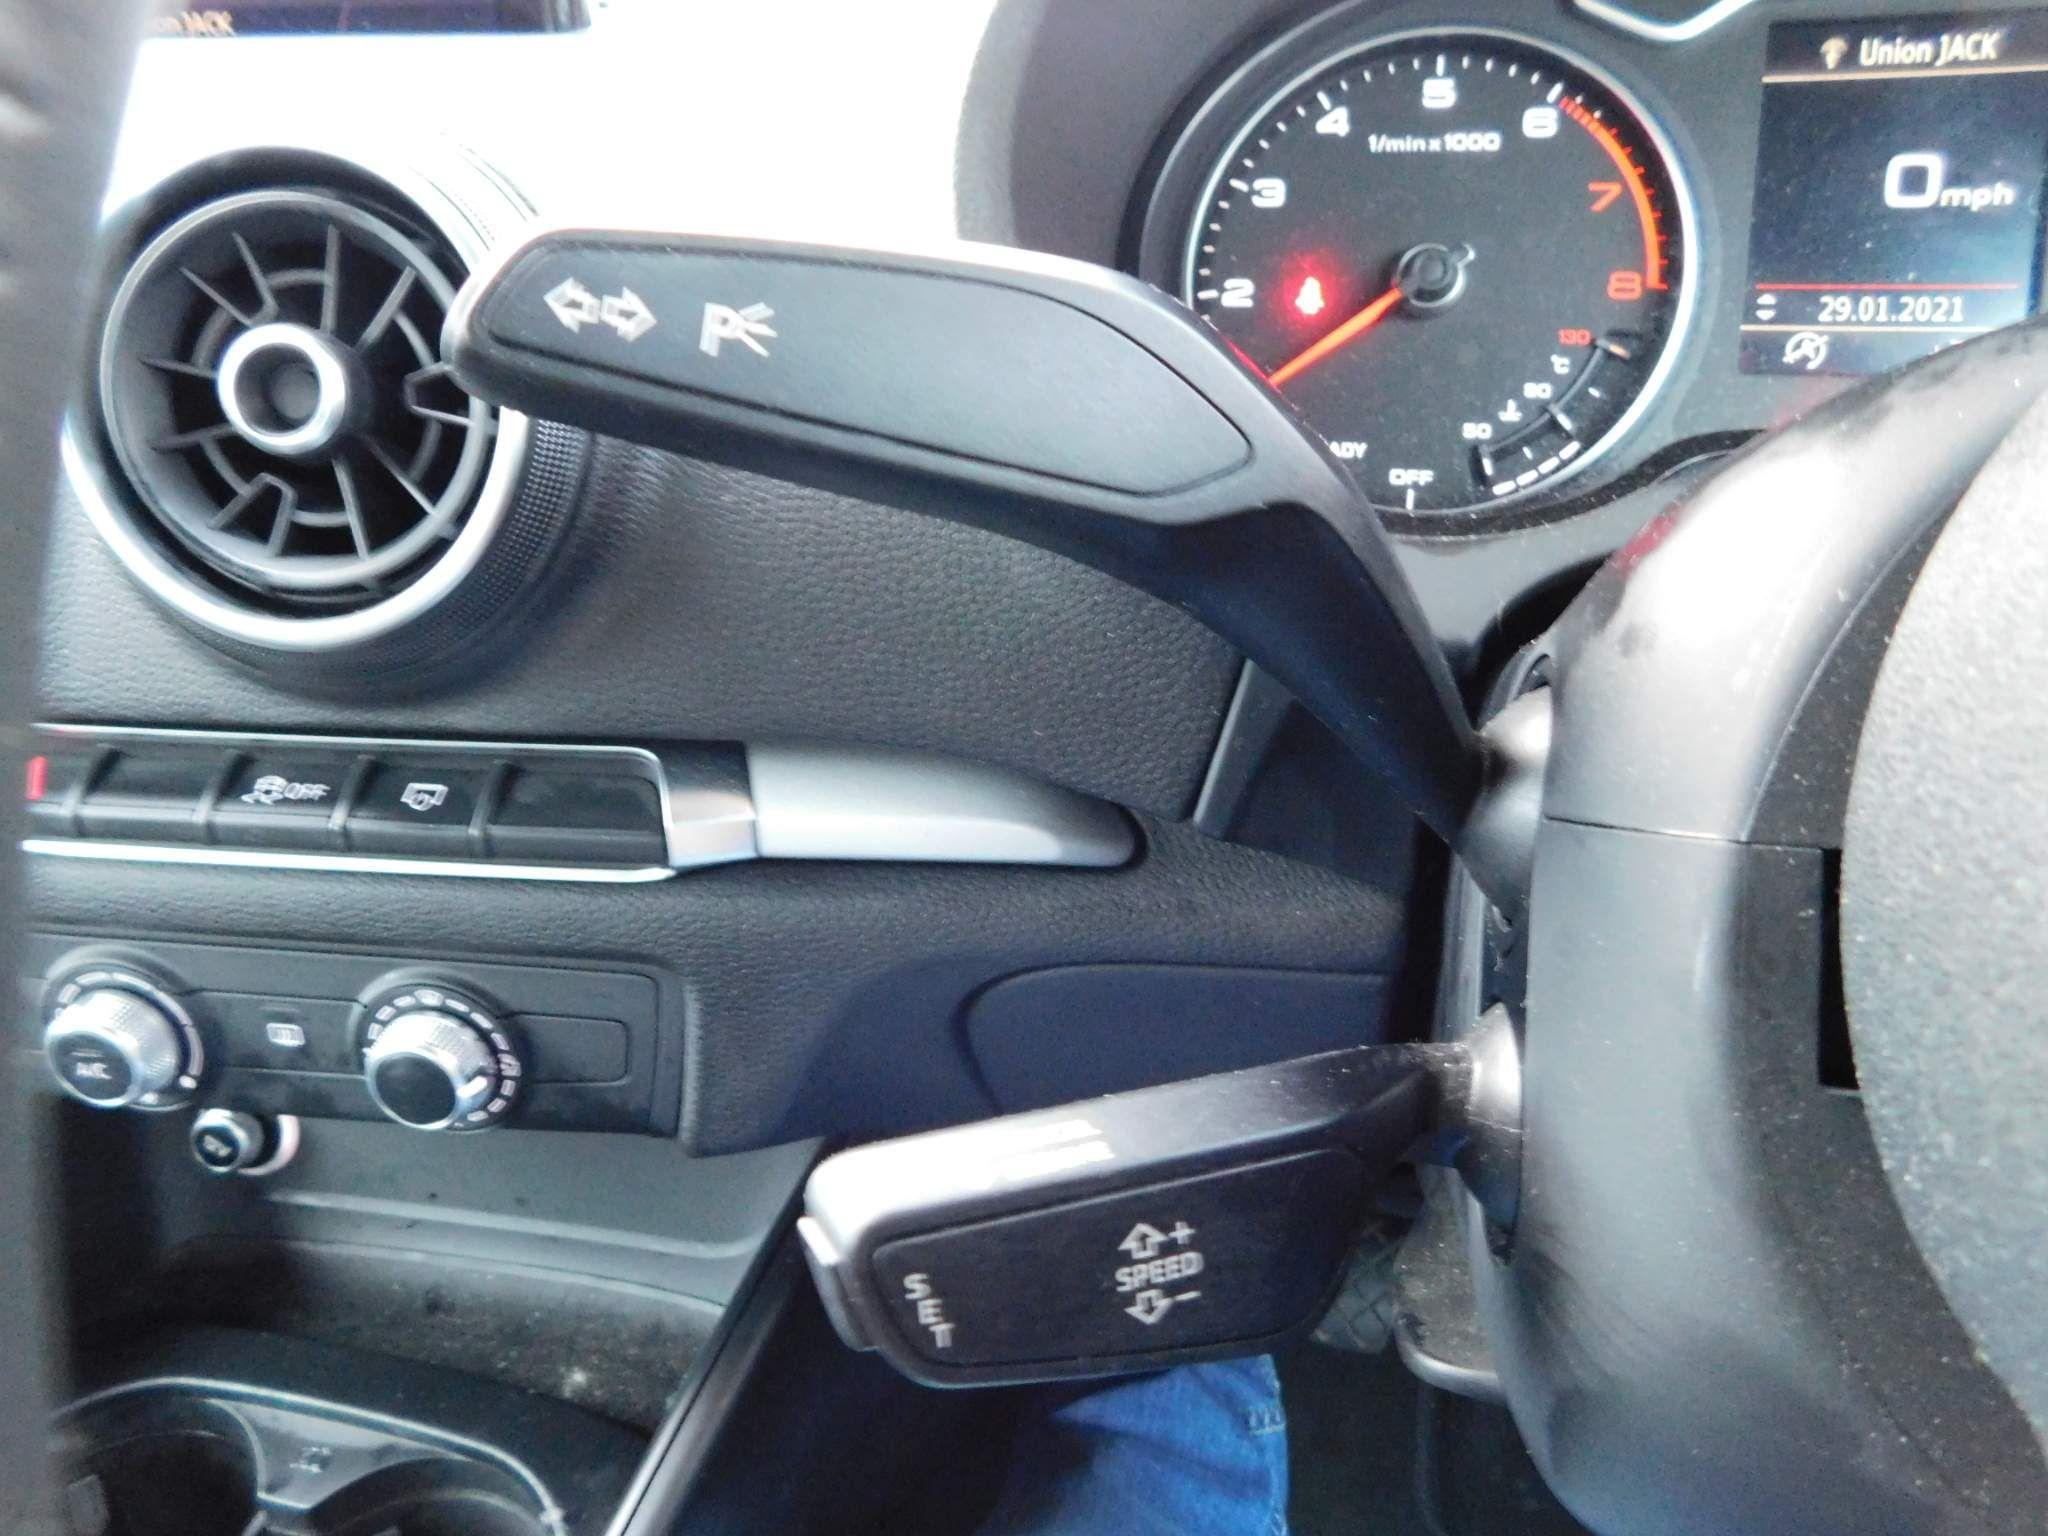 2017 AUDI A3 1.0 TFSI SE Sportback (s/s) Petrol Manual just arrived – Meadow Cars Carrickfergus full